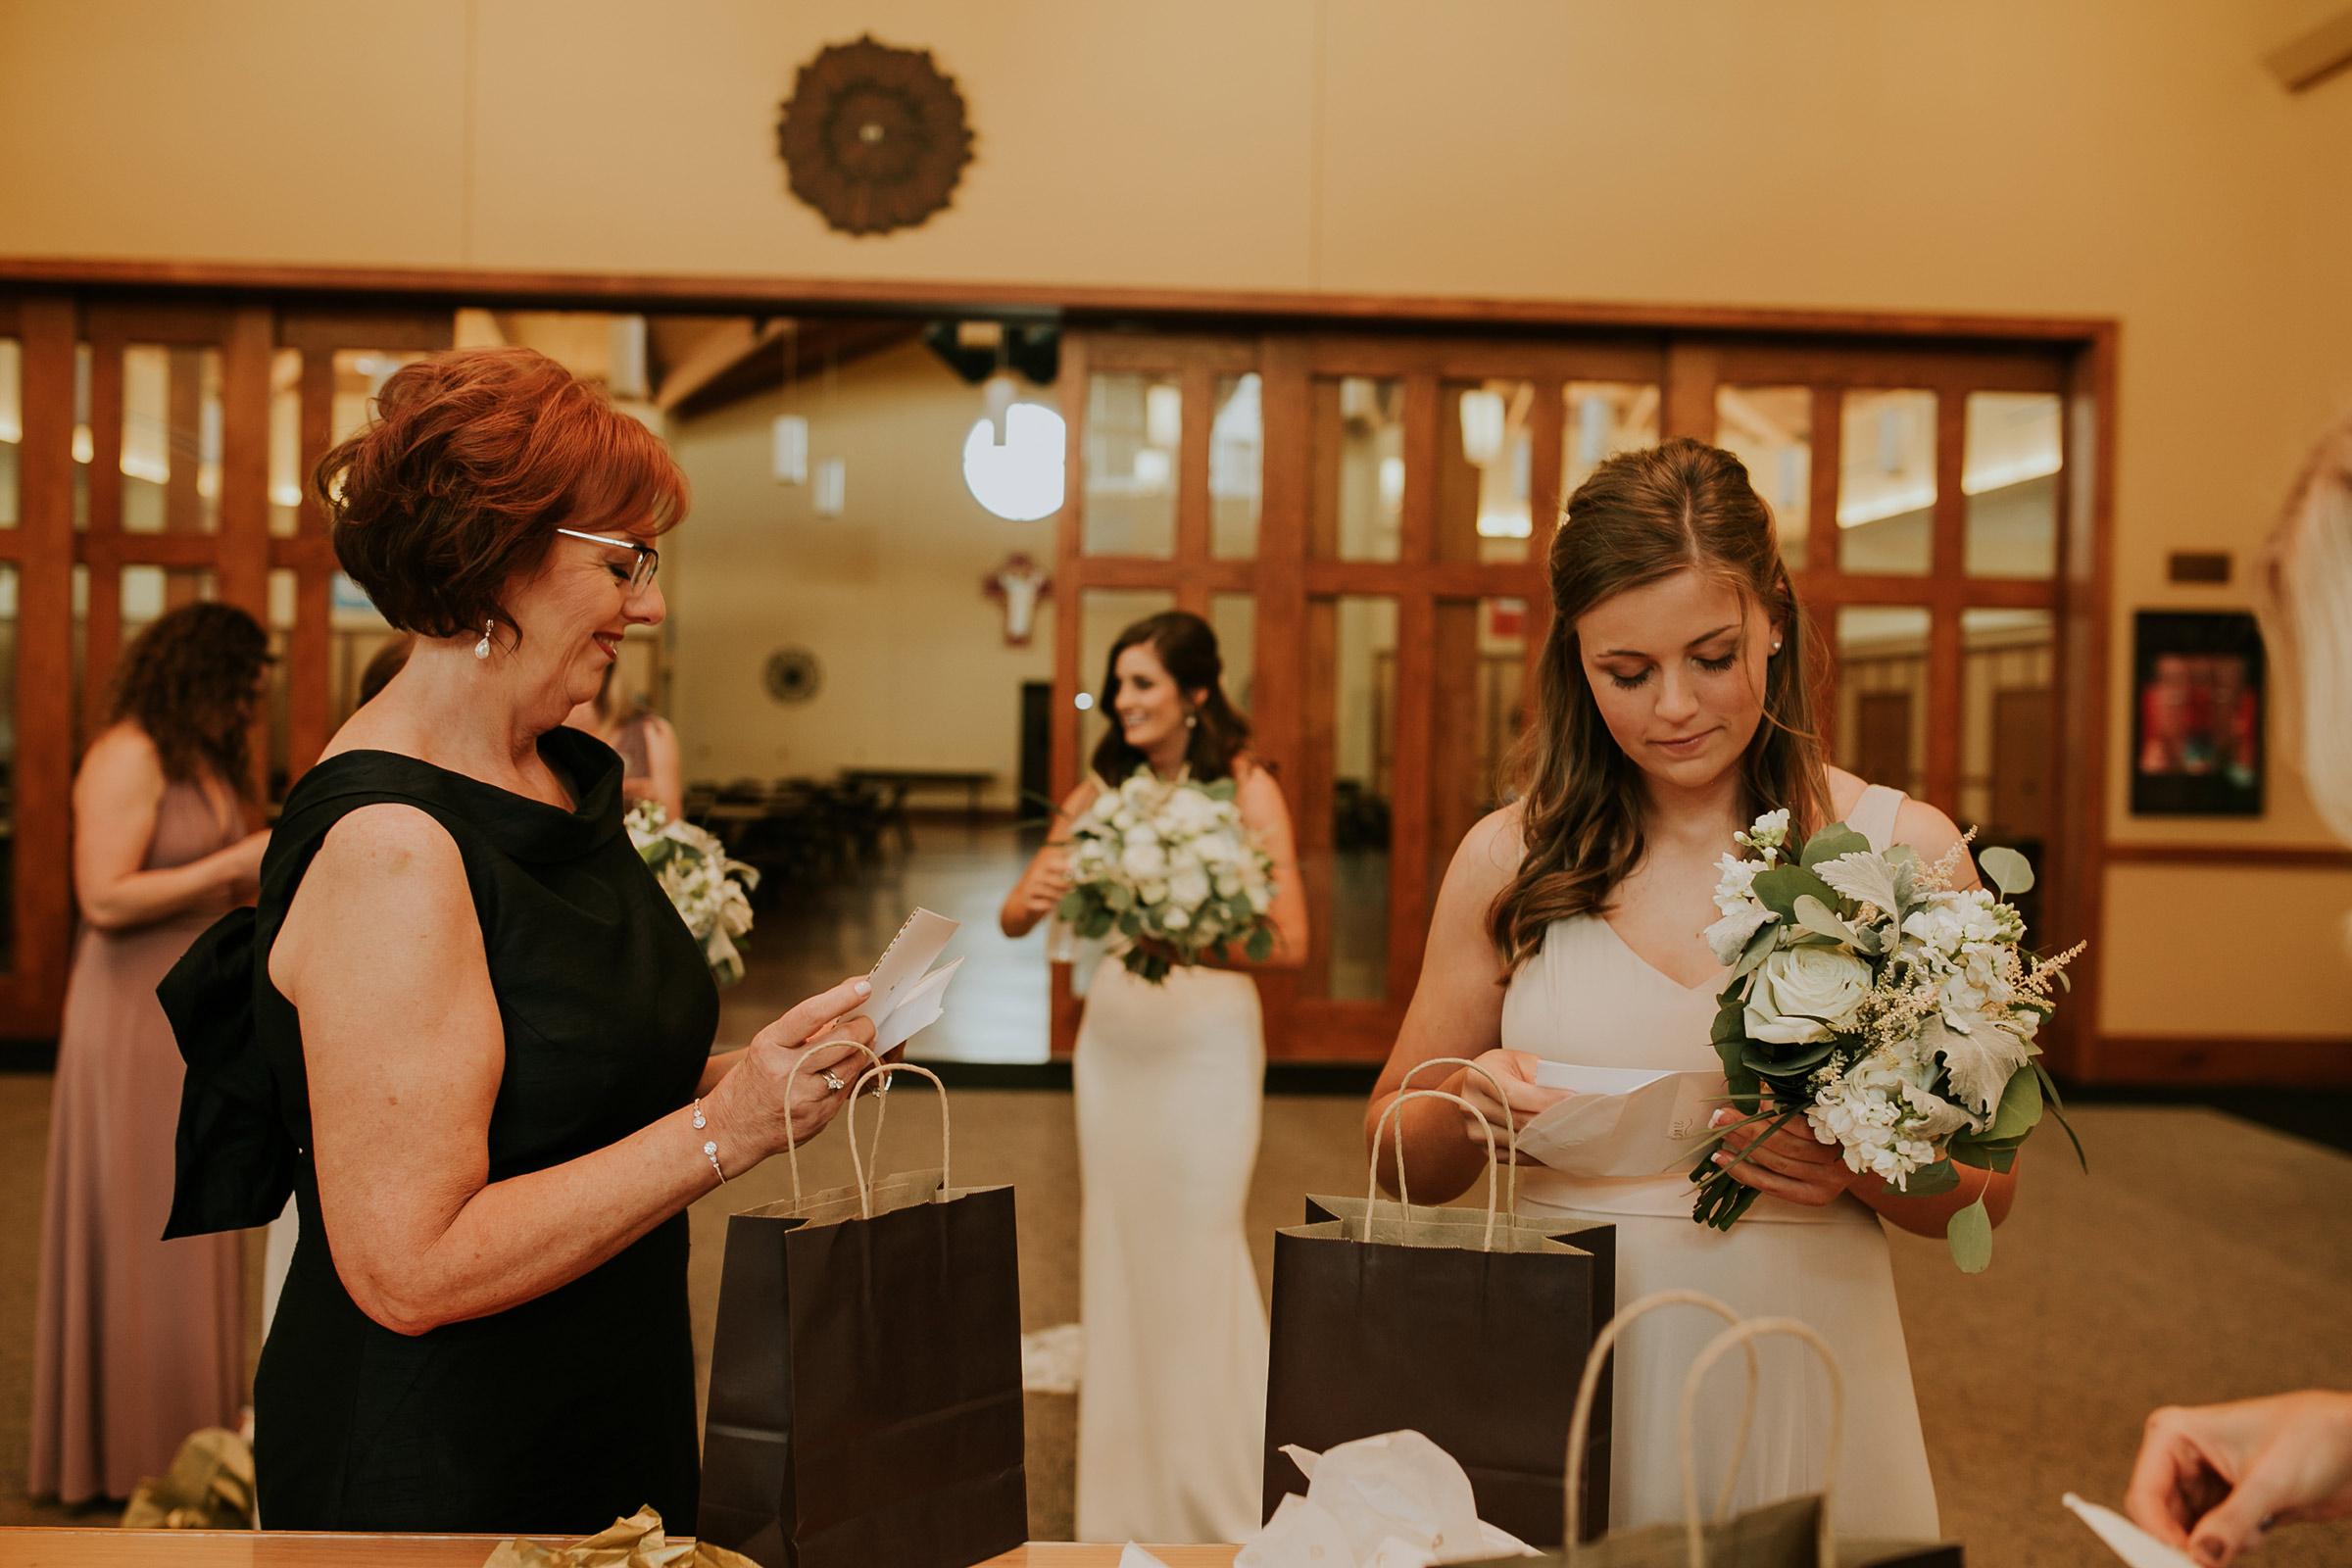 mr-mrs-hull-mother-of-bride-opening-gift-st-boniface-church-waukee-desmoines-iowa-raelyn-ramey-photography-193.jpg